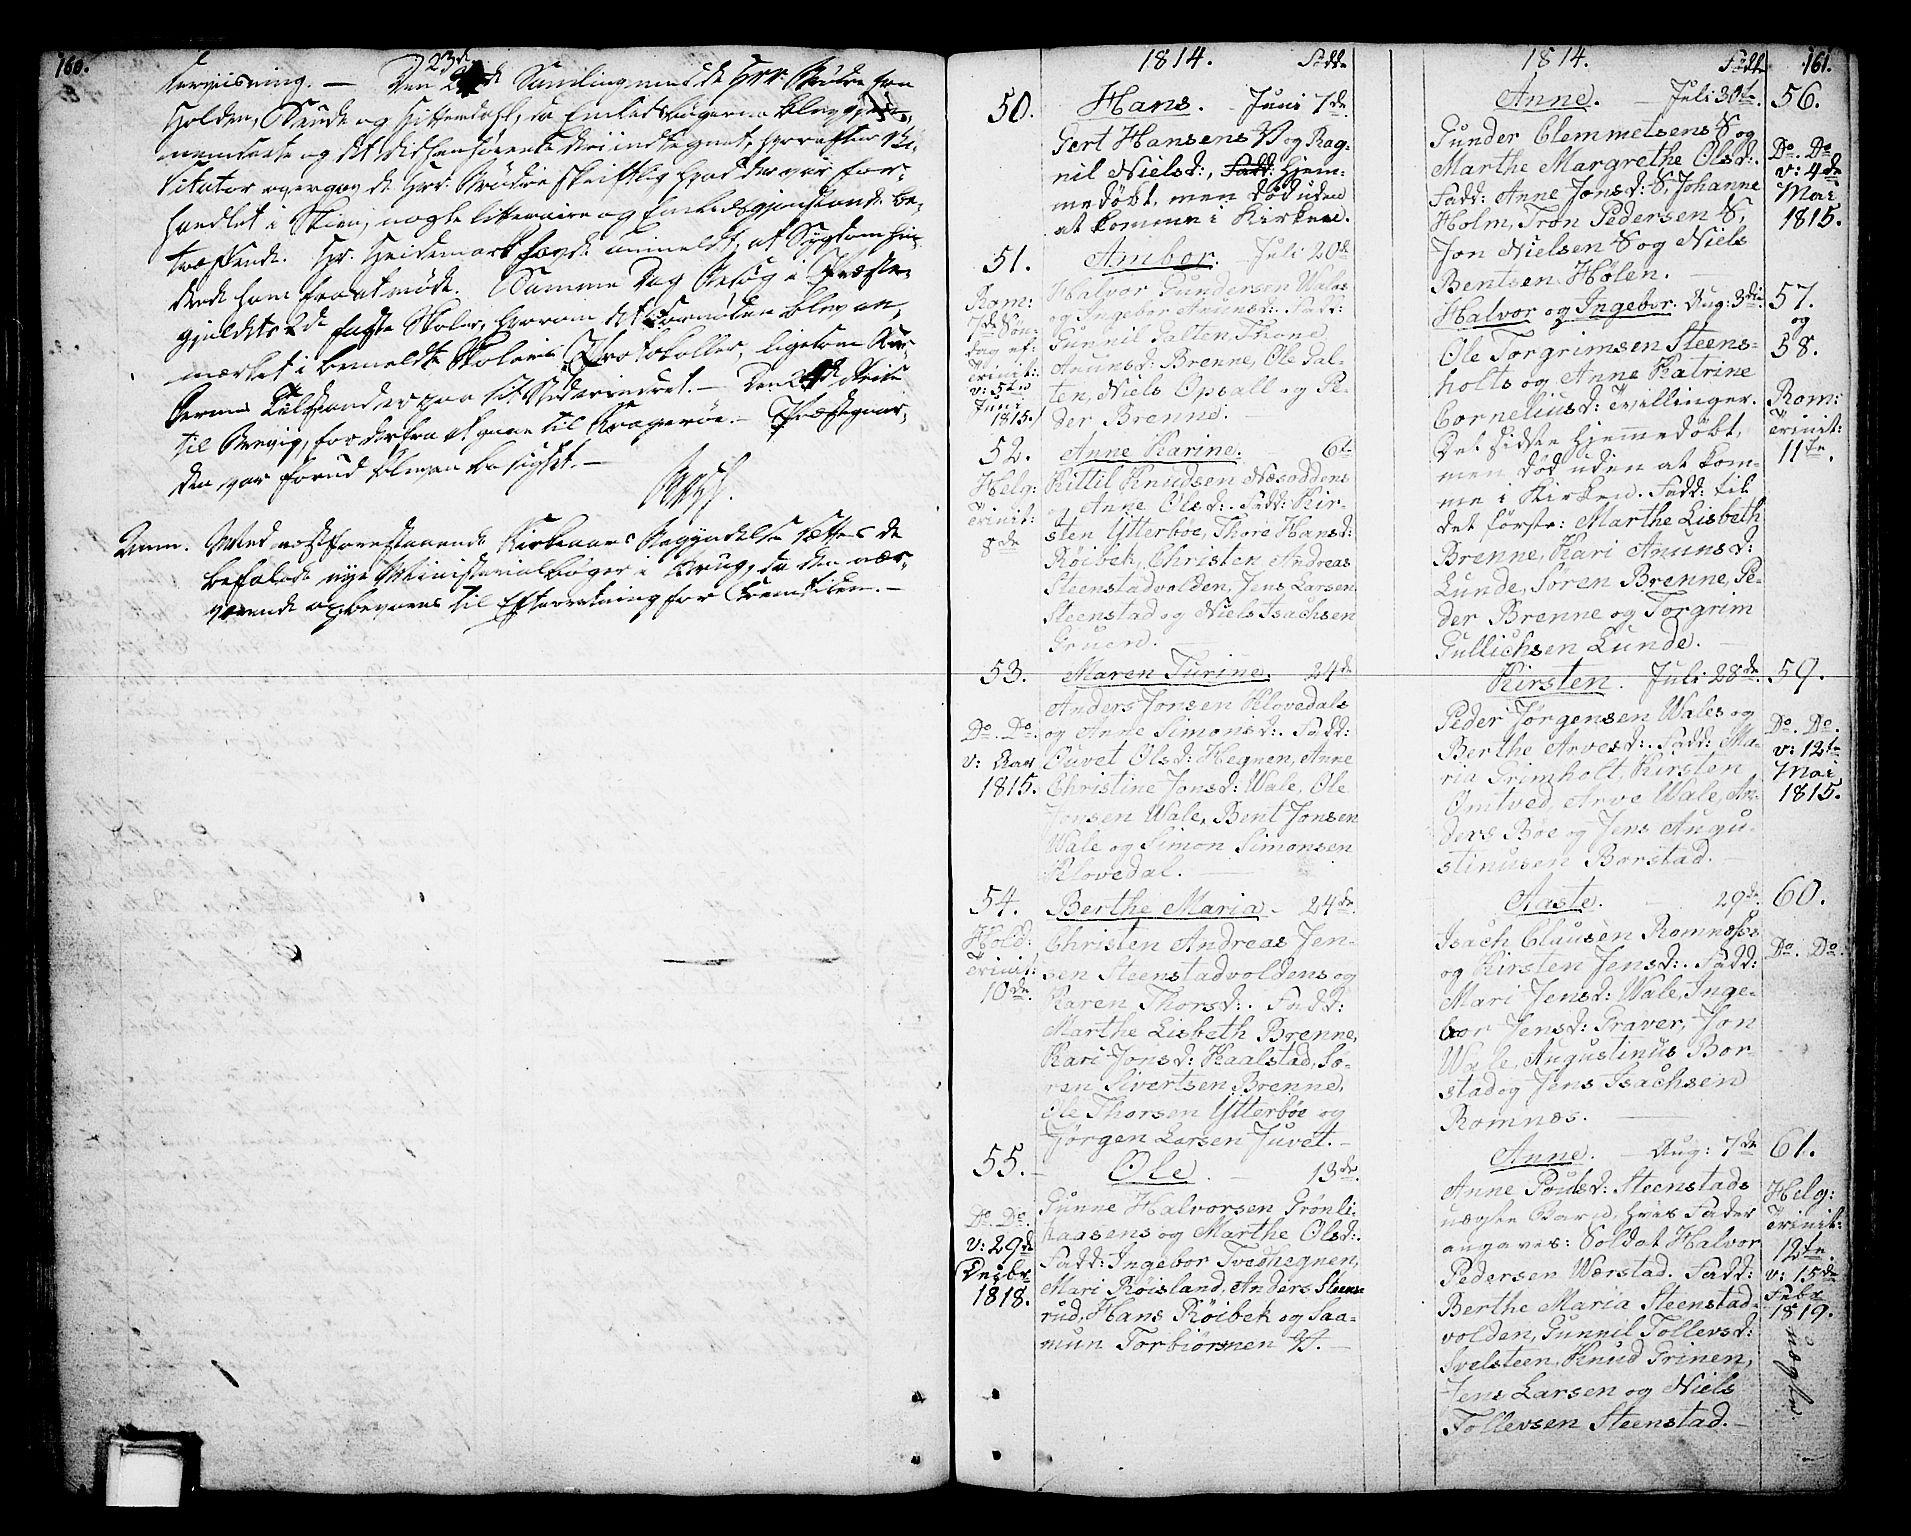 SAKO, Holla kirkebøker, F/Fa/L0002: Ministerialbok nr. 2, 1779-1814, s. 160-161